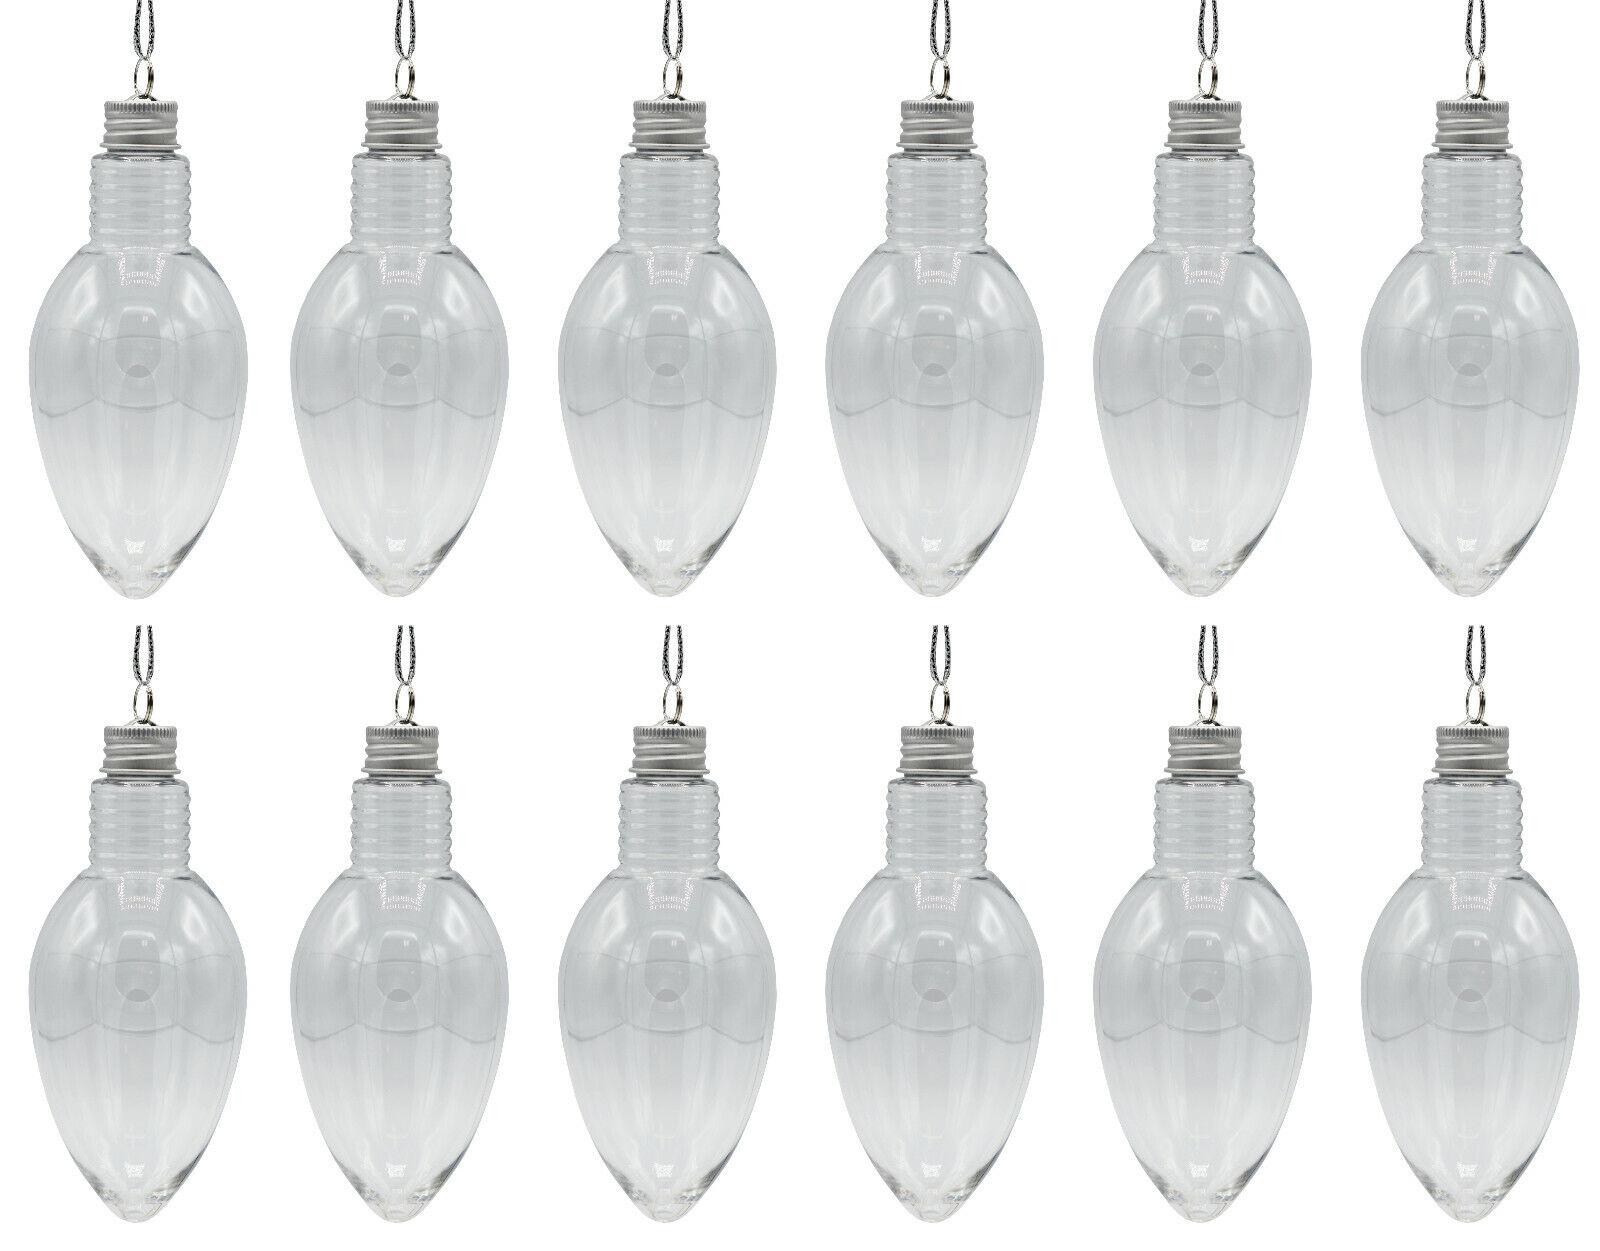 Box of 12 – 5.5 Inch Fillable Light Bulb Shape Clear Plastic Christmas Ornaments Holiday & Seasonal Décor